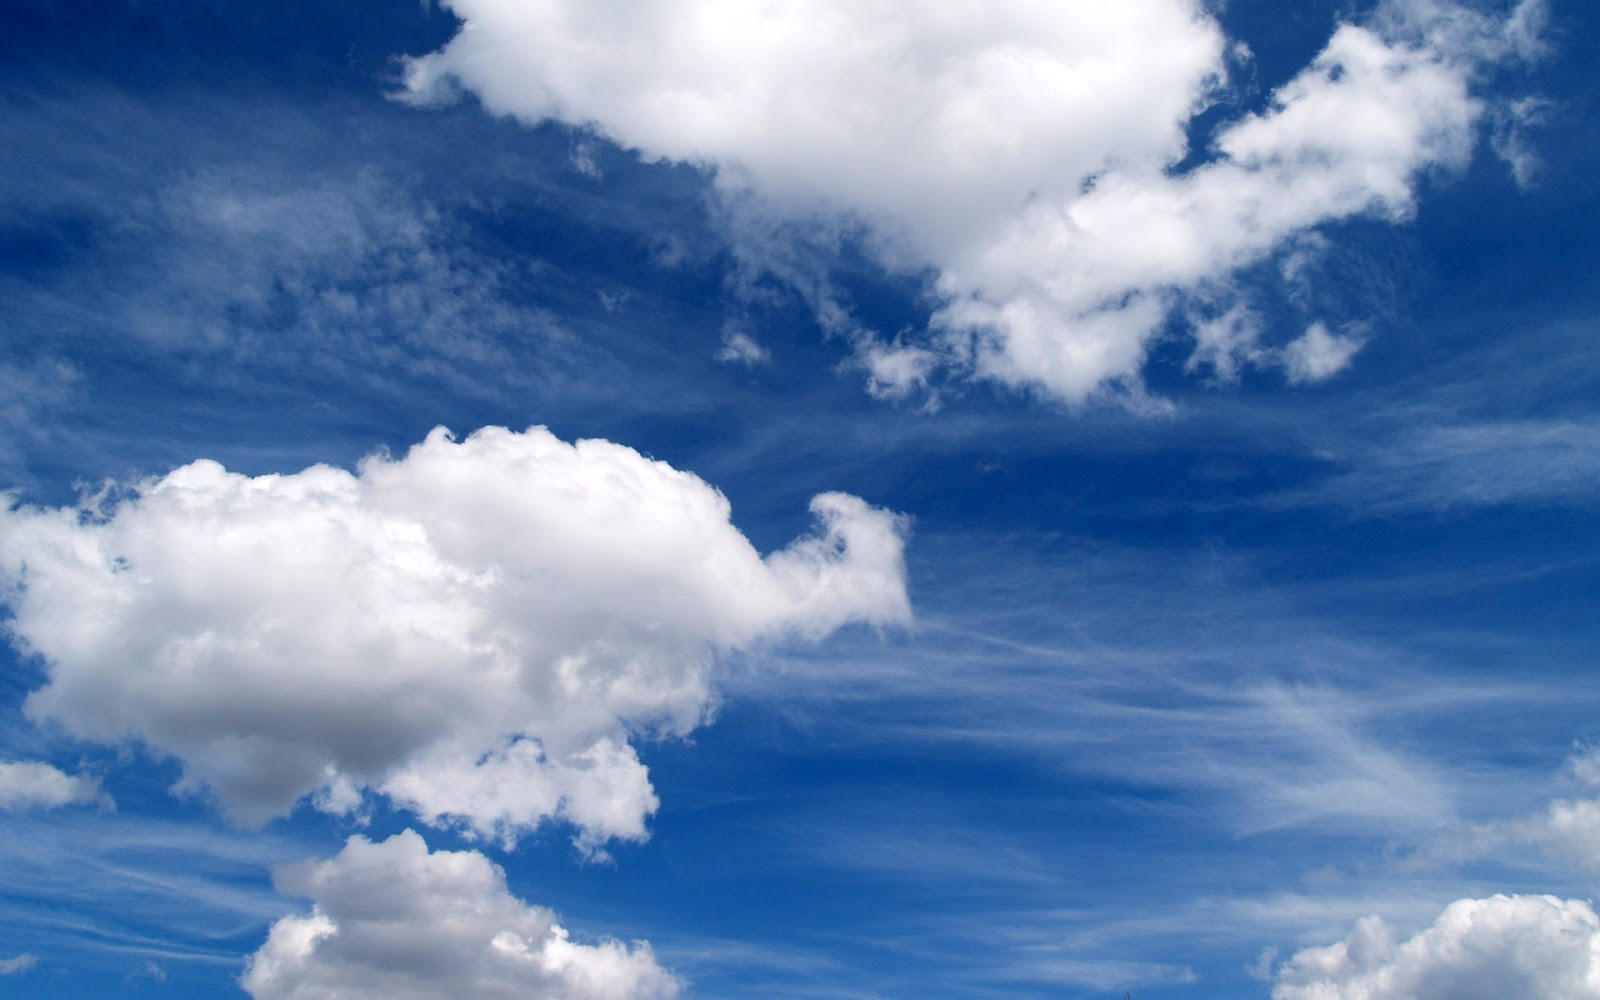 http://2.bp.blogspot.com/-aIdBprp7eoo/UCFAfFJMs6I/AAAAAAAAEmY/RYtLo4YYy_A/s1600/Day-sky.jpg